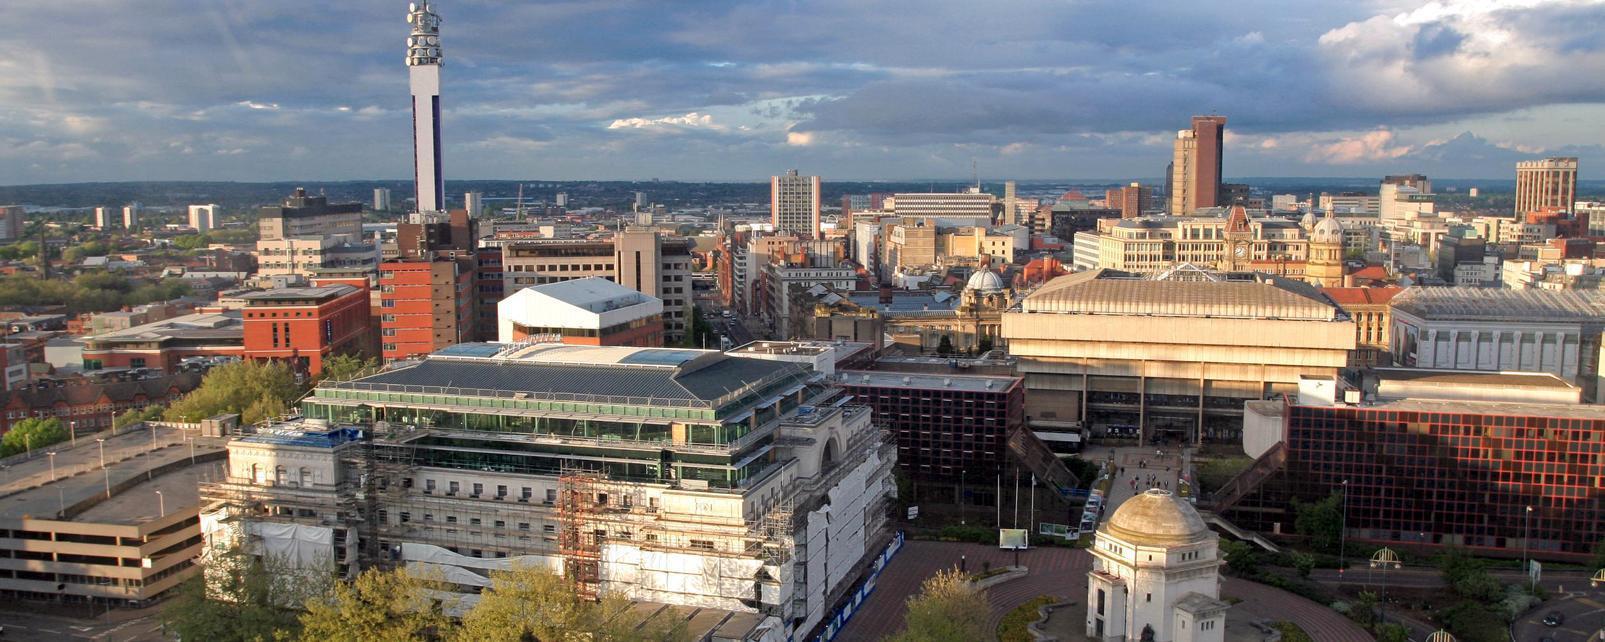 Europe; Royaume-Uni; Angleterre; Birmingham;